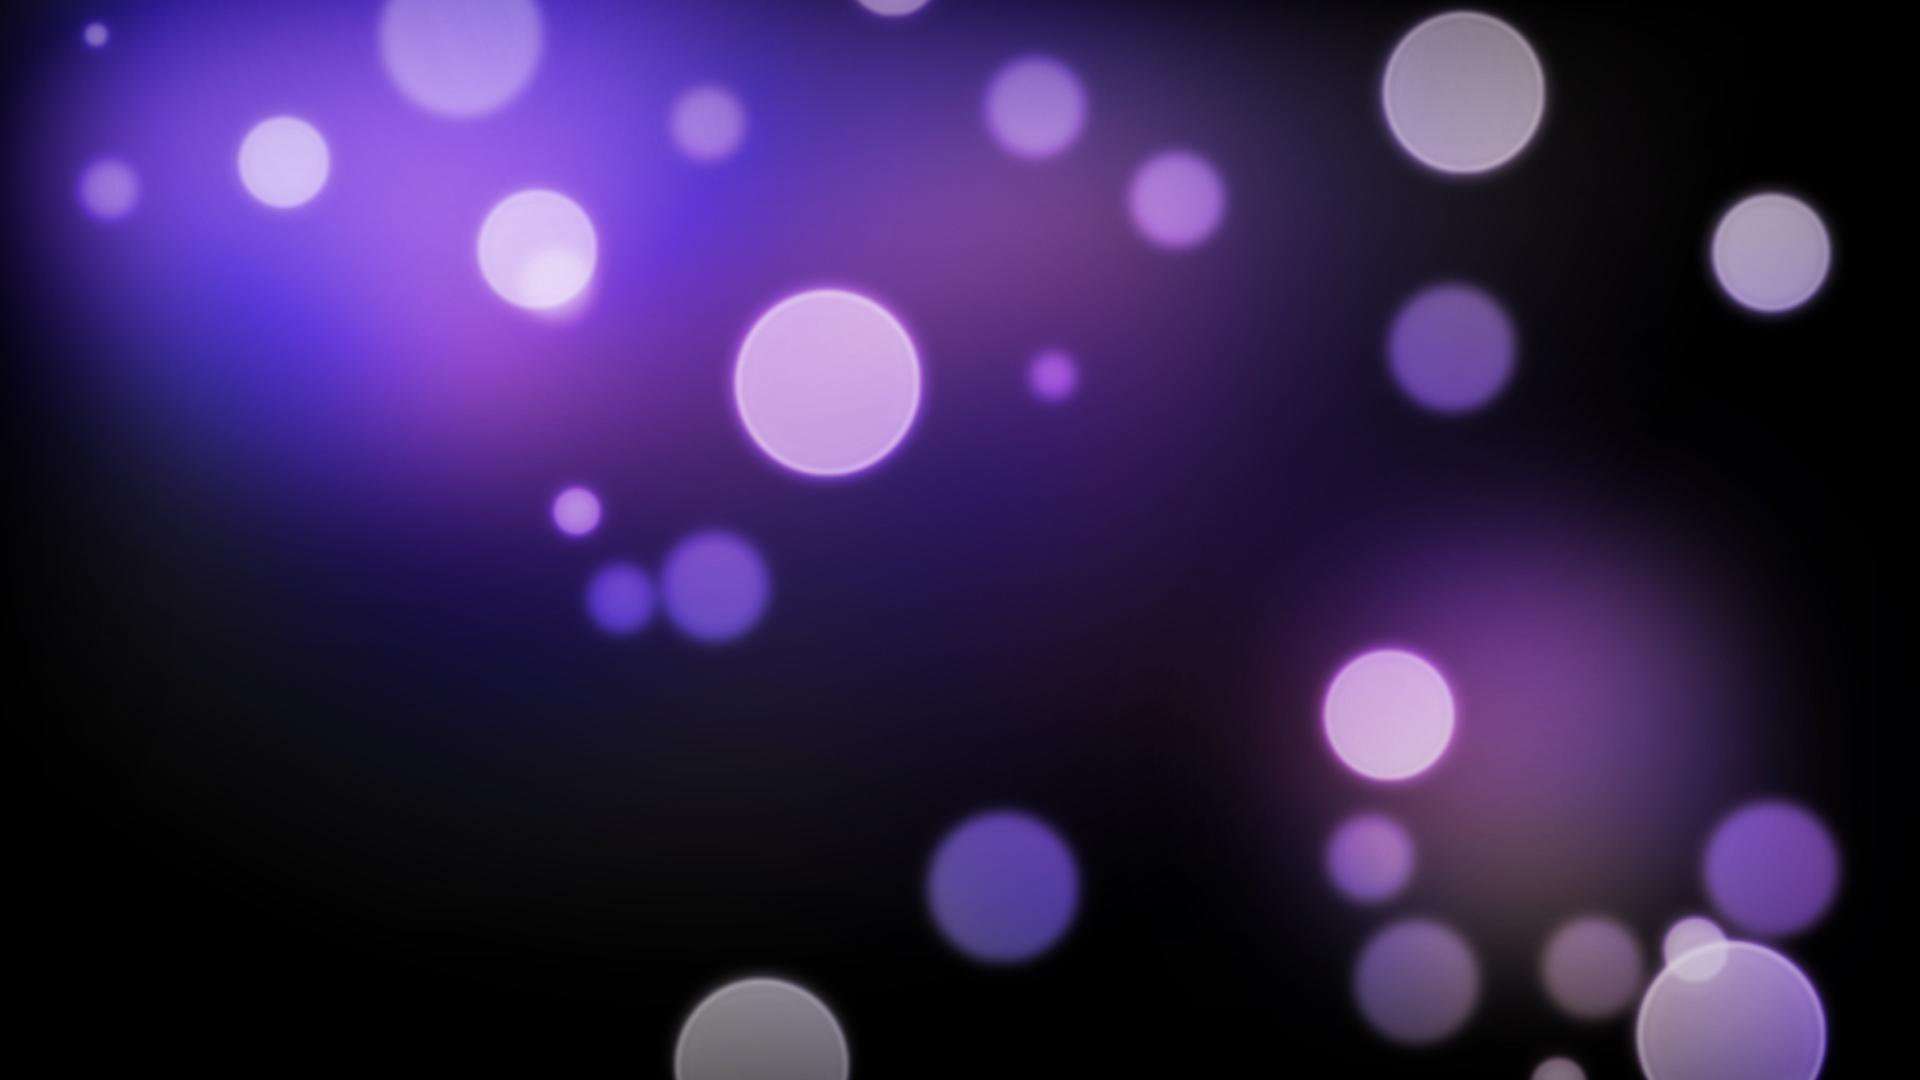 purple abstract hd photos